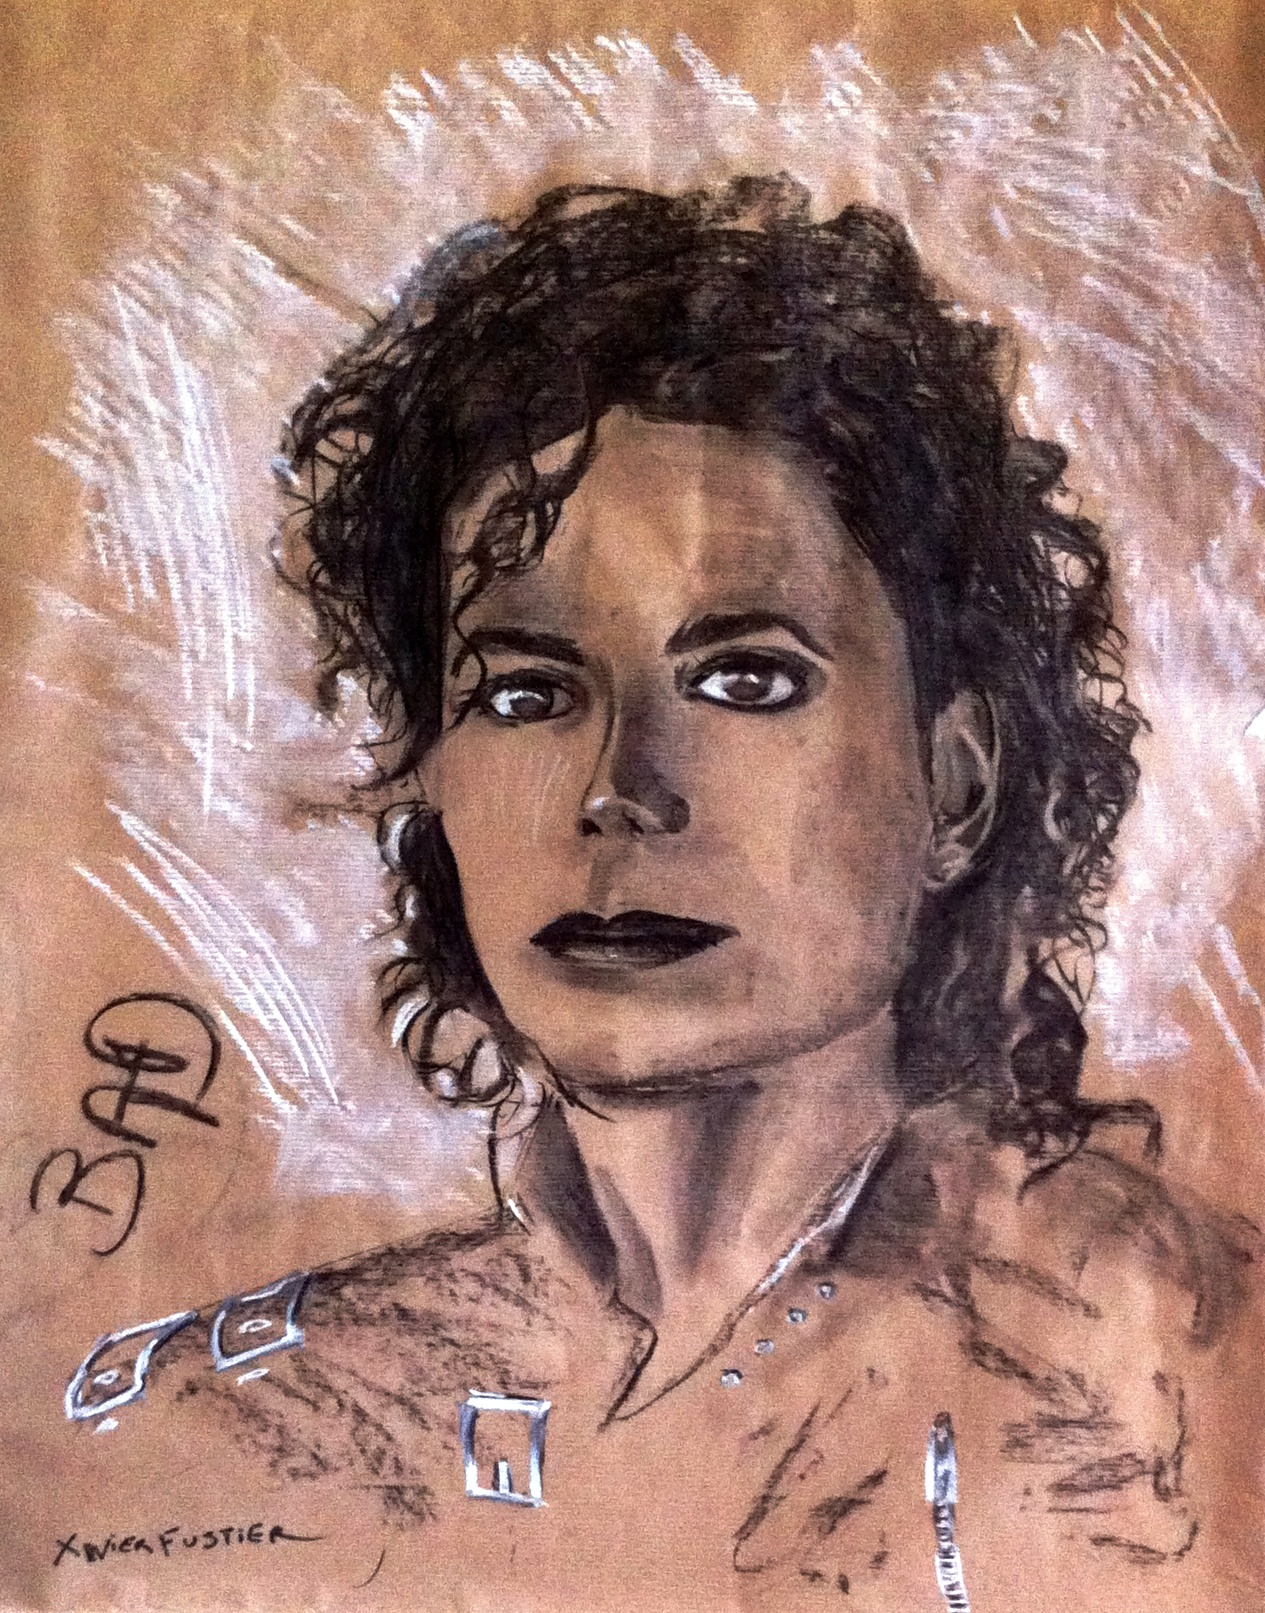 Michael Jackson 1987 BAD